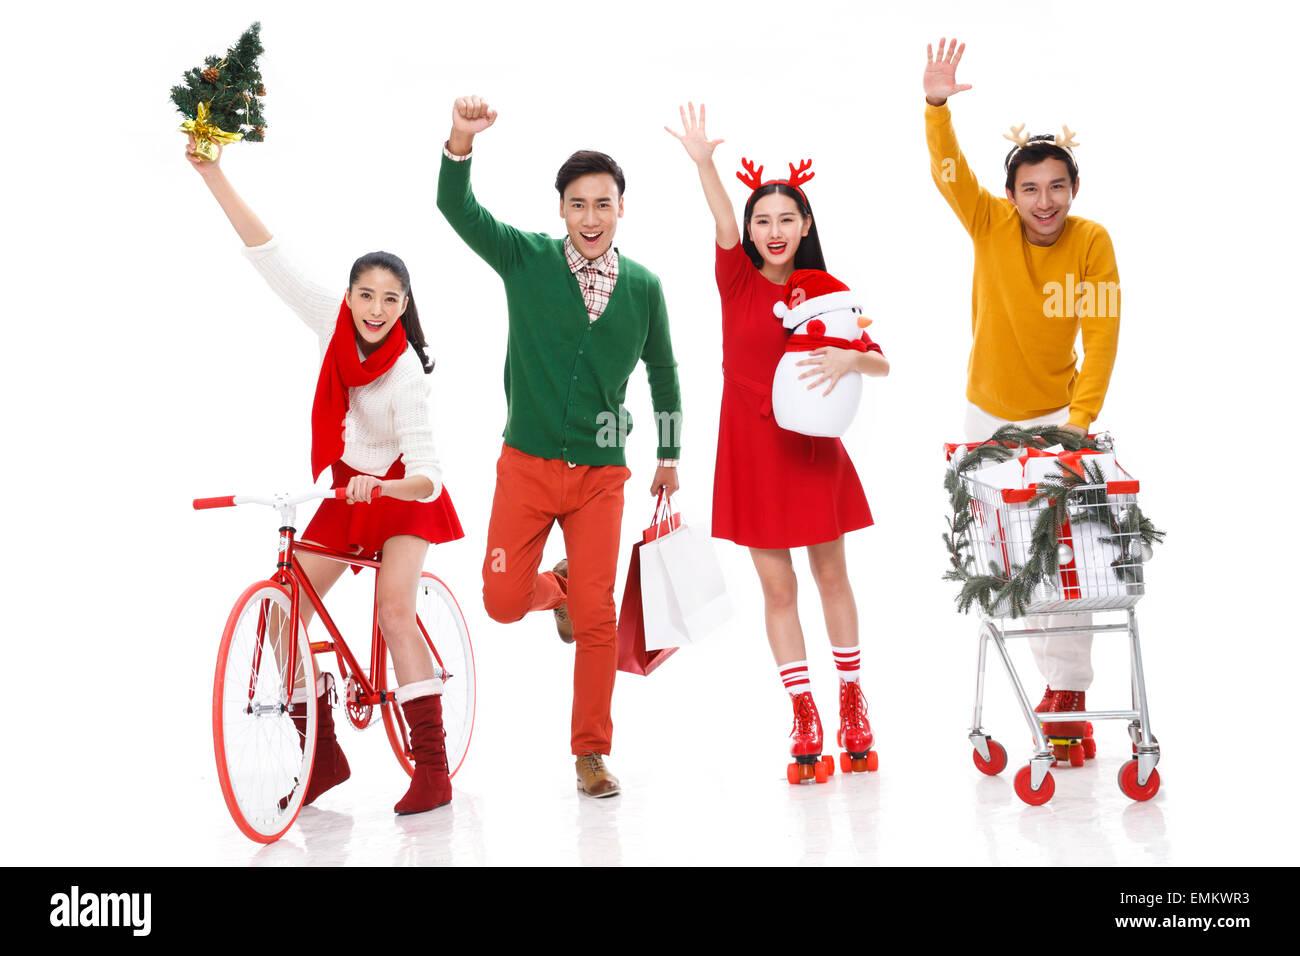 Young men and women joyous Christmas shopping - Stock Image